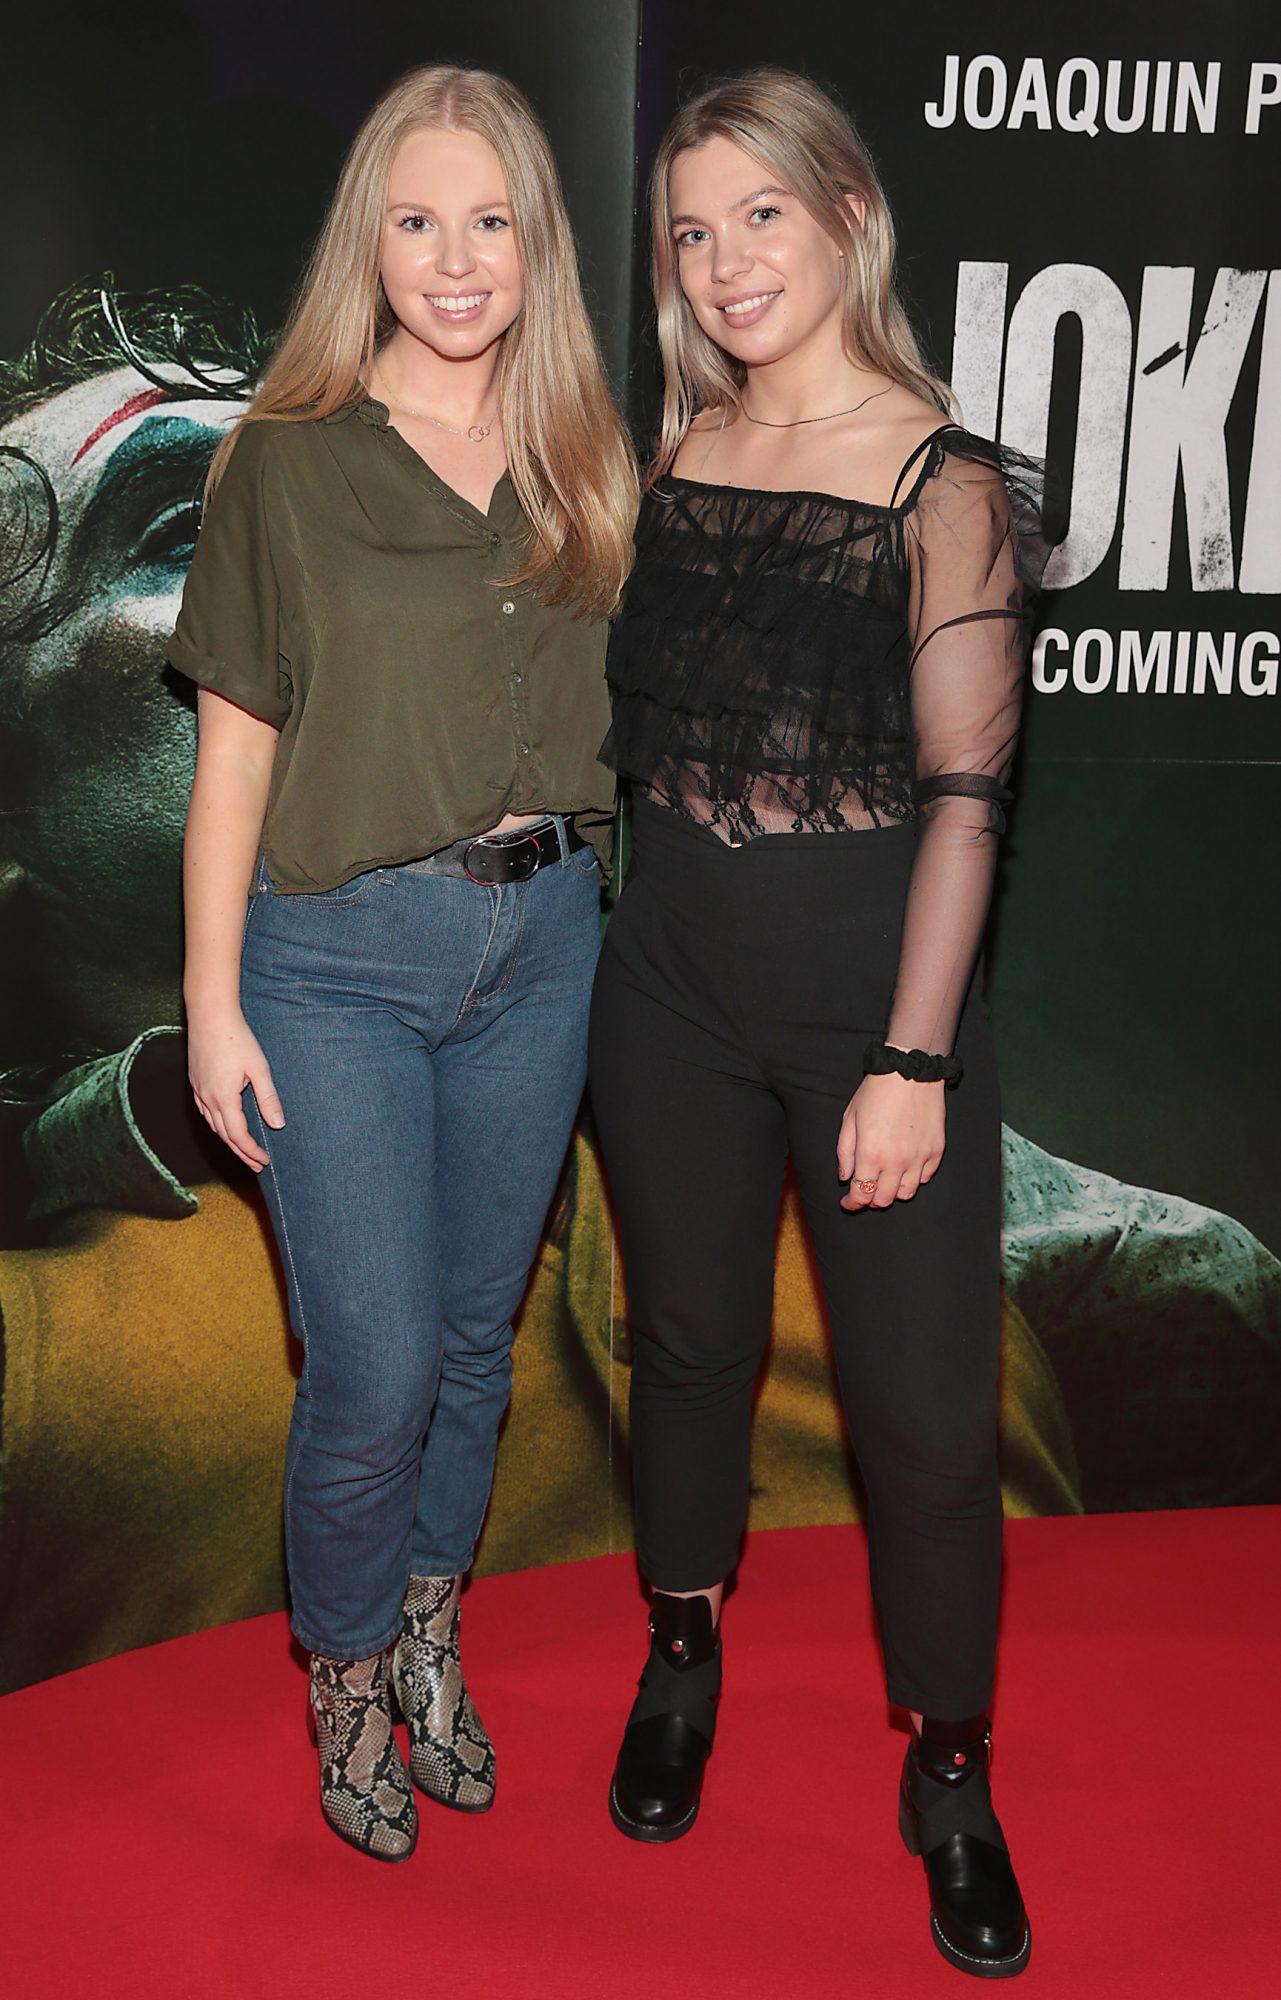 Erica Browne and Ashley Mahon at the Irish Premiere screening of Joker at Cineworld, Dublin. Pic: Brian McEvoy.